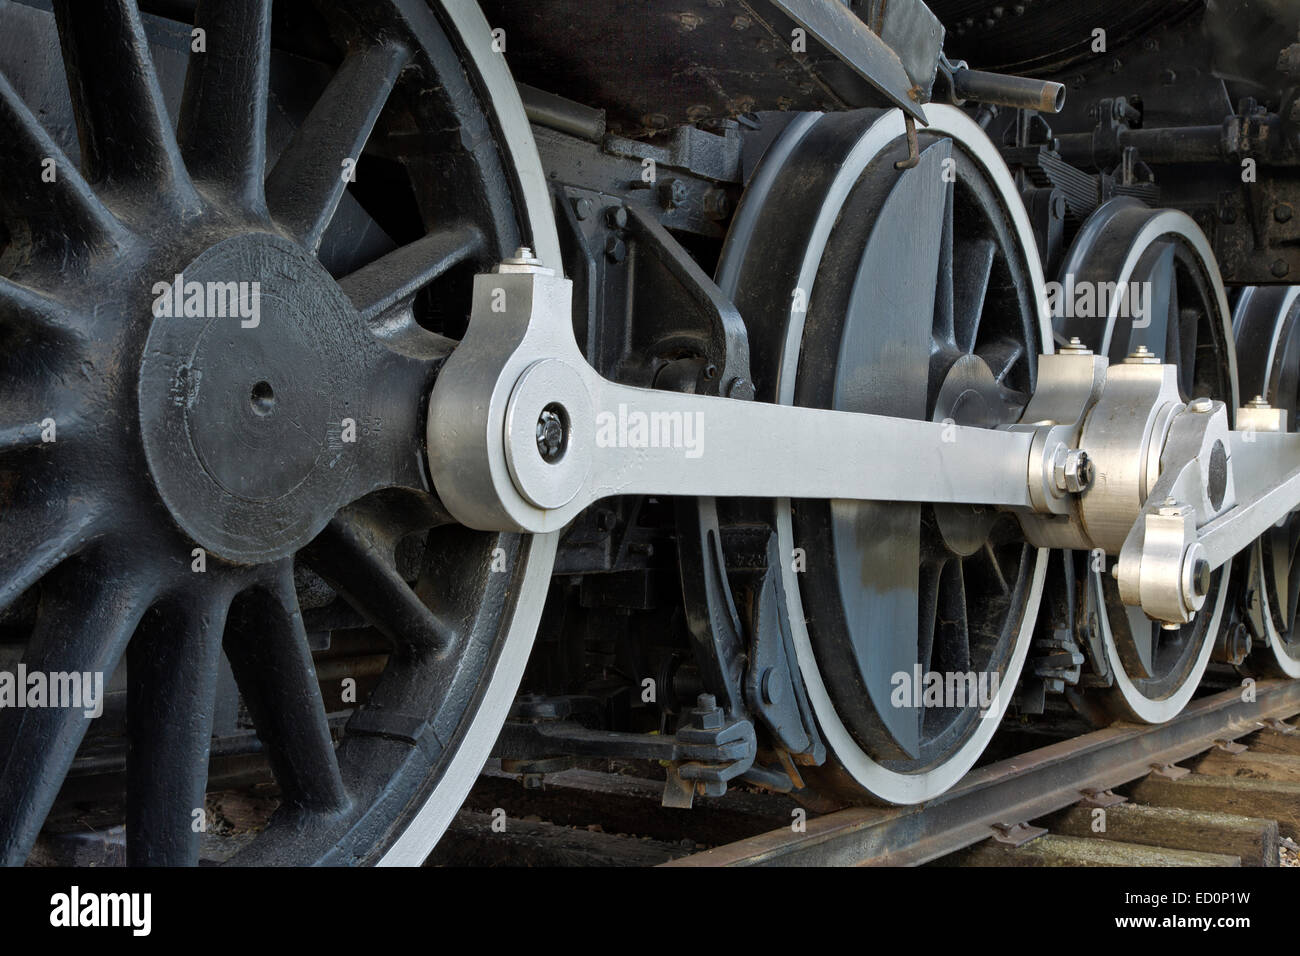 Le ruote motrici, 440 SooLine locomotiva a vapore. Immagini Stock